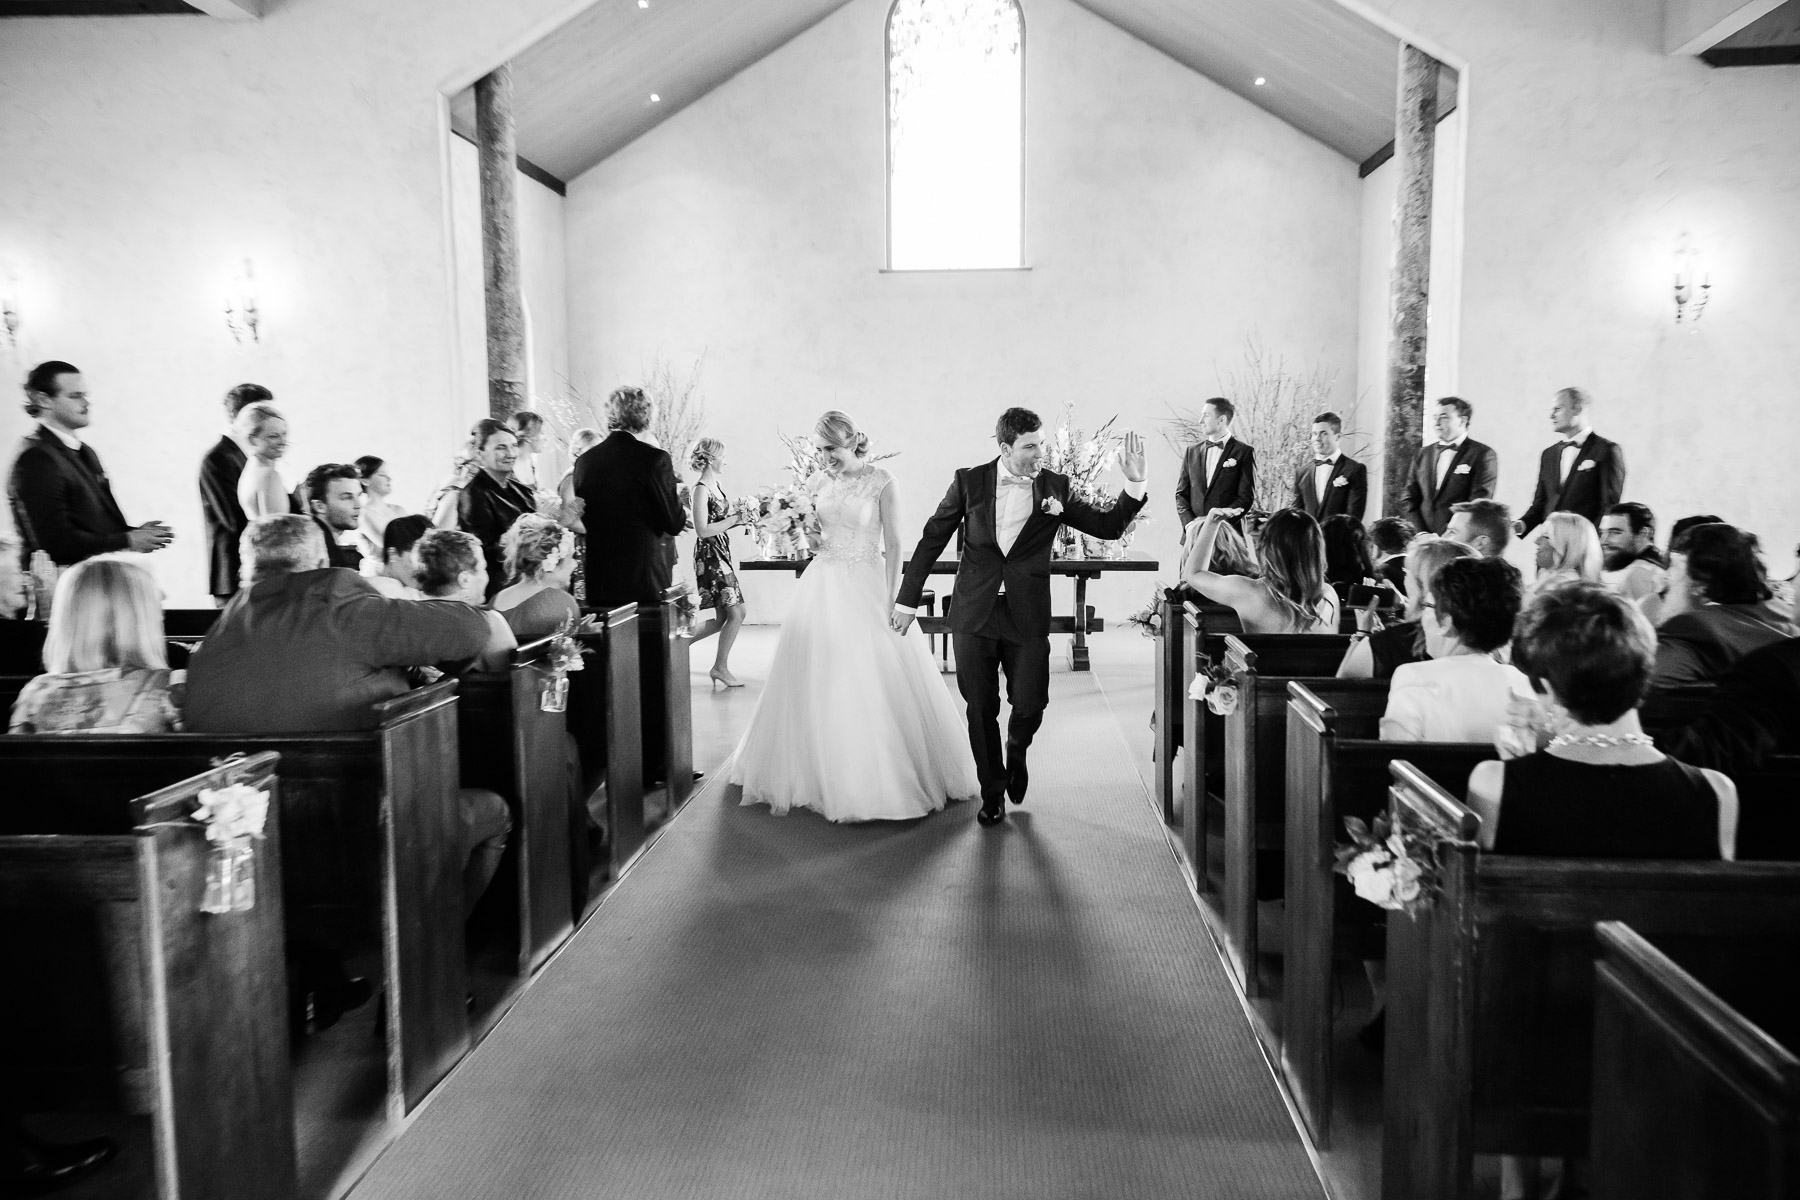 Marnie_and_Charlie_Yarra_Valley_Wedding_Blog-54.jpg